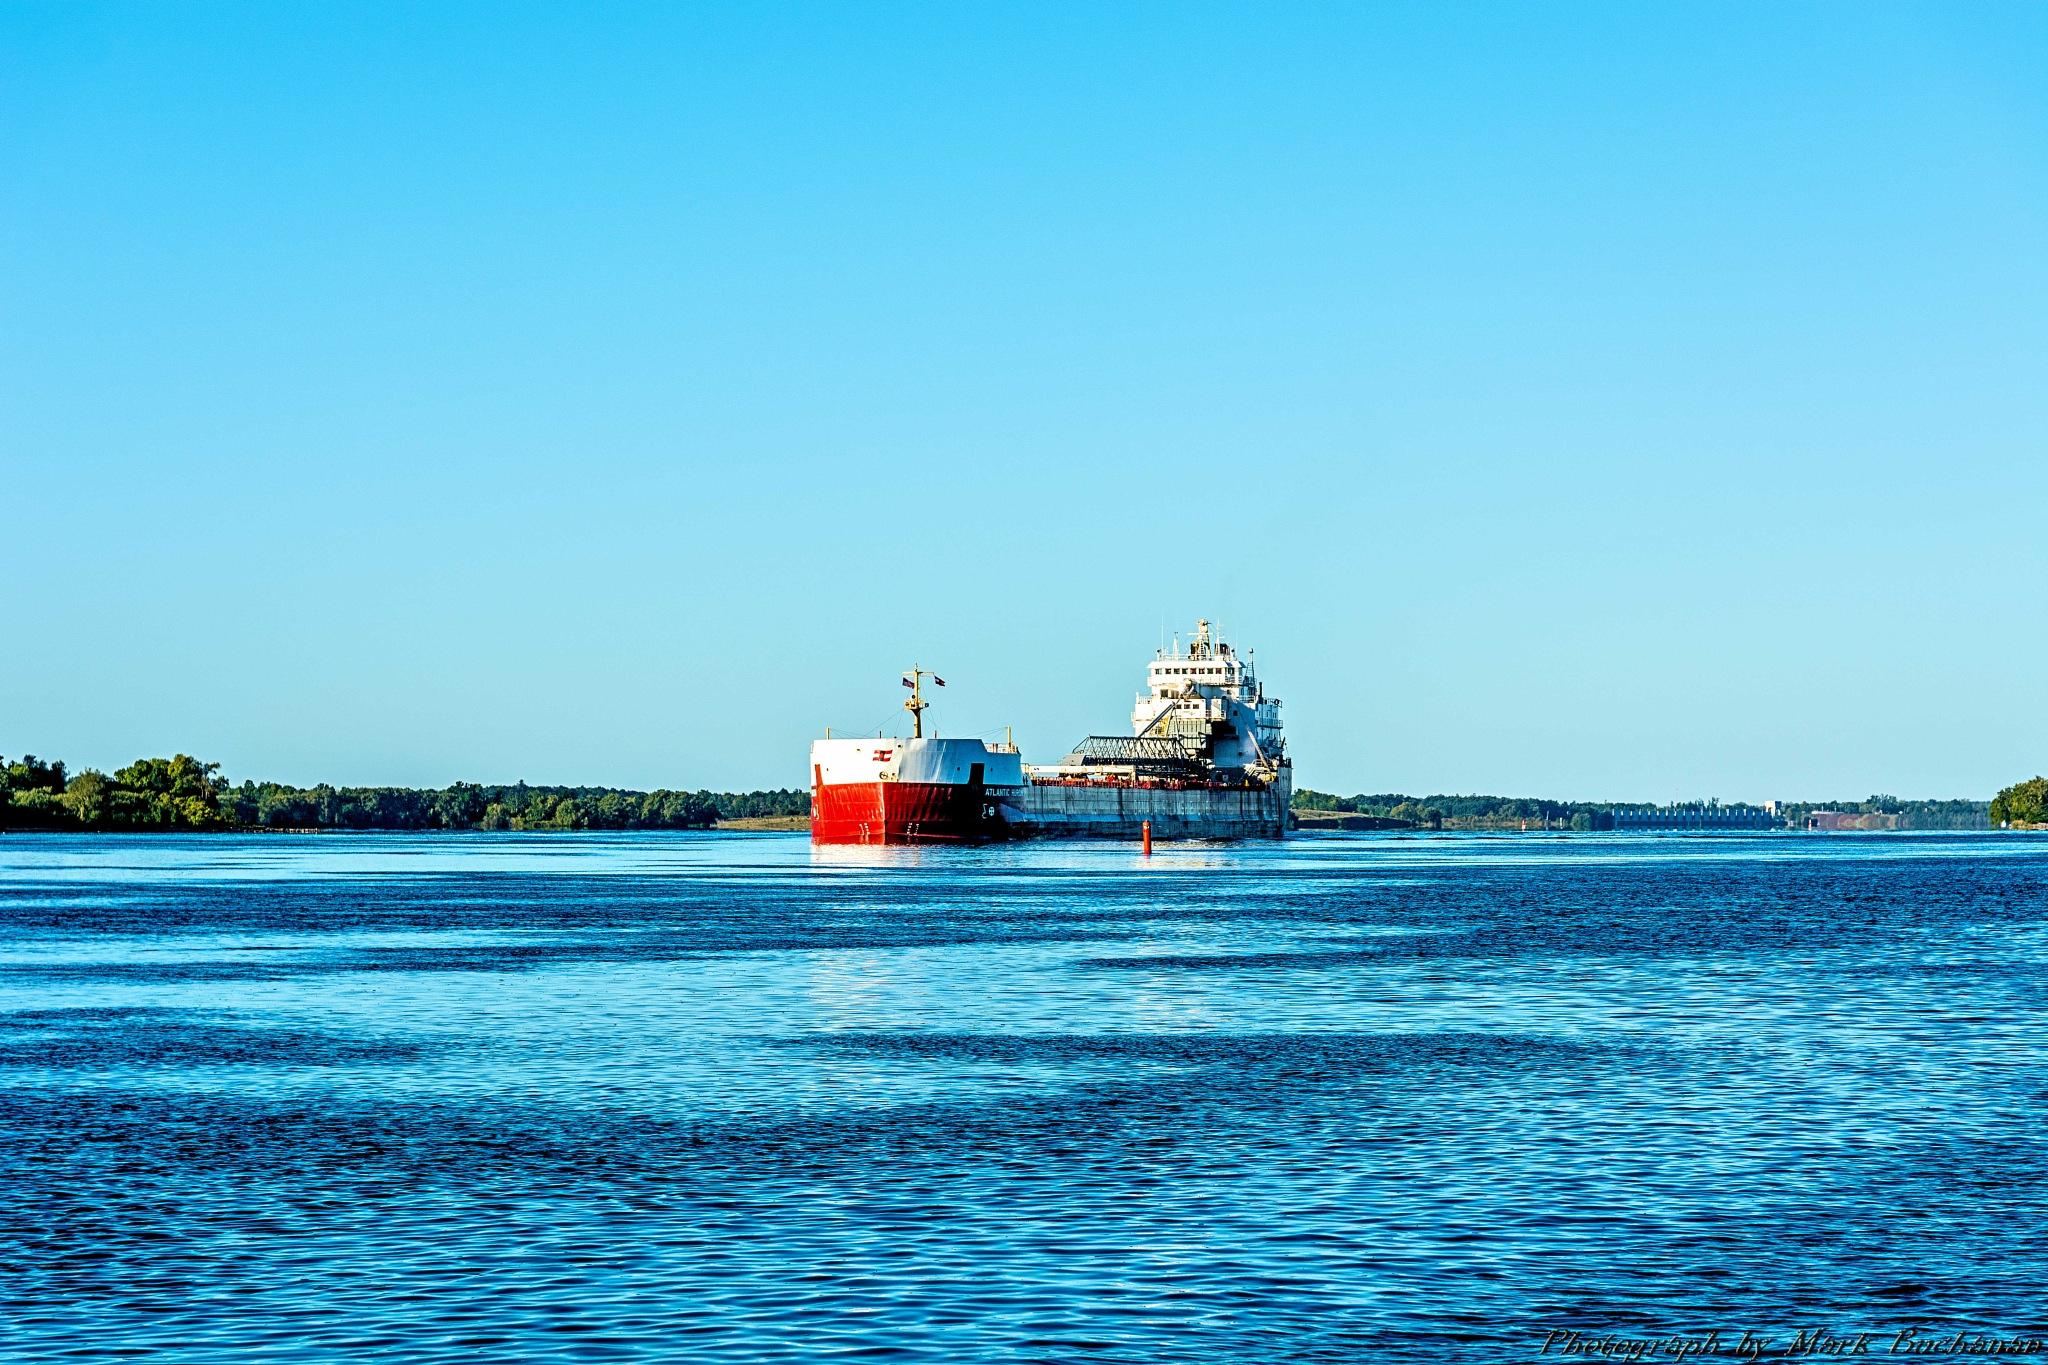 East bound freighter #1 by Mark Buchanan